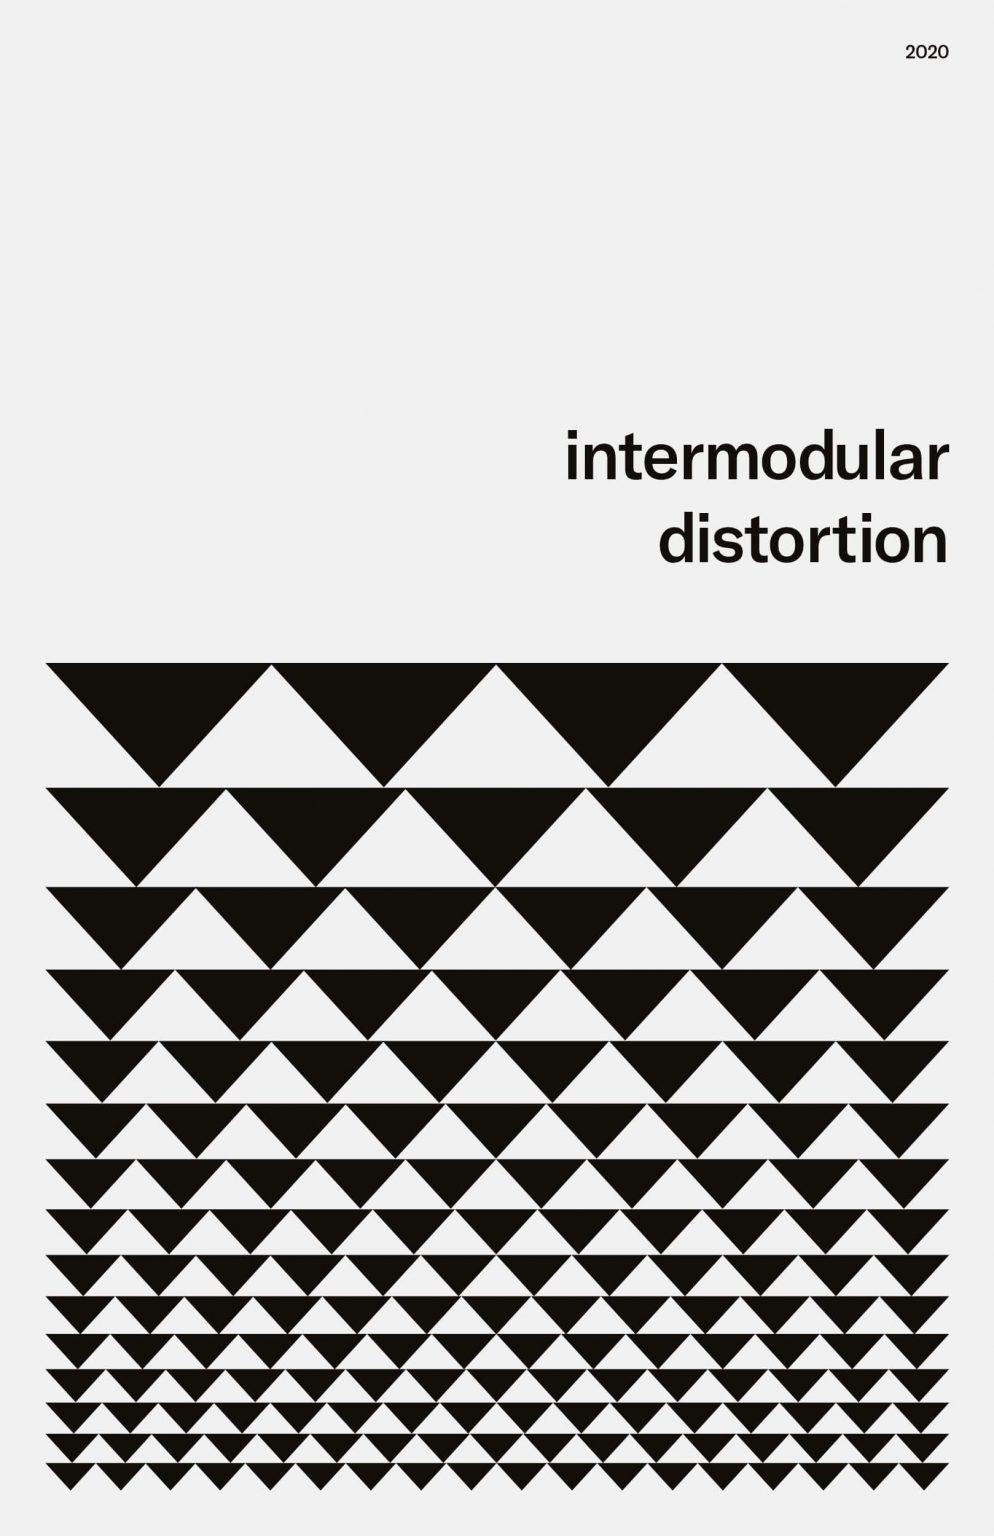 Niklas Beab Intermodular Distorion Poster Design